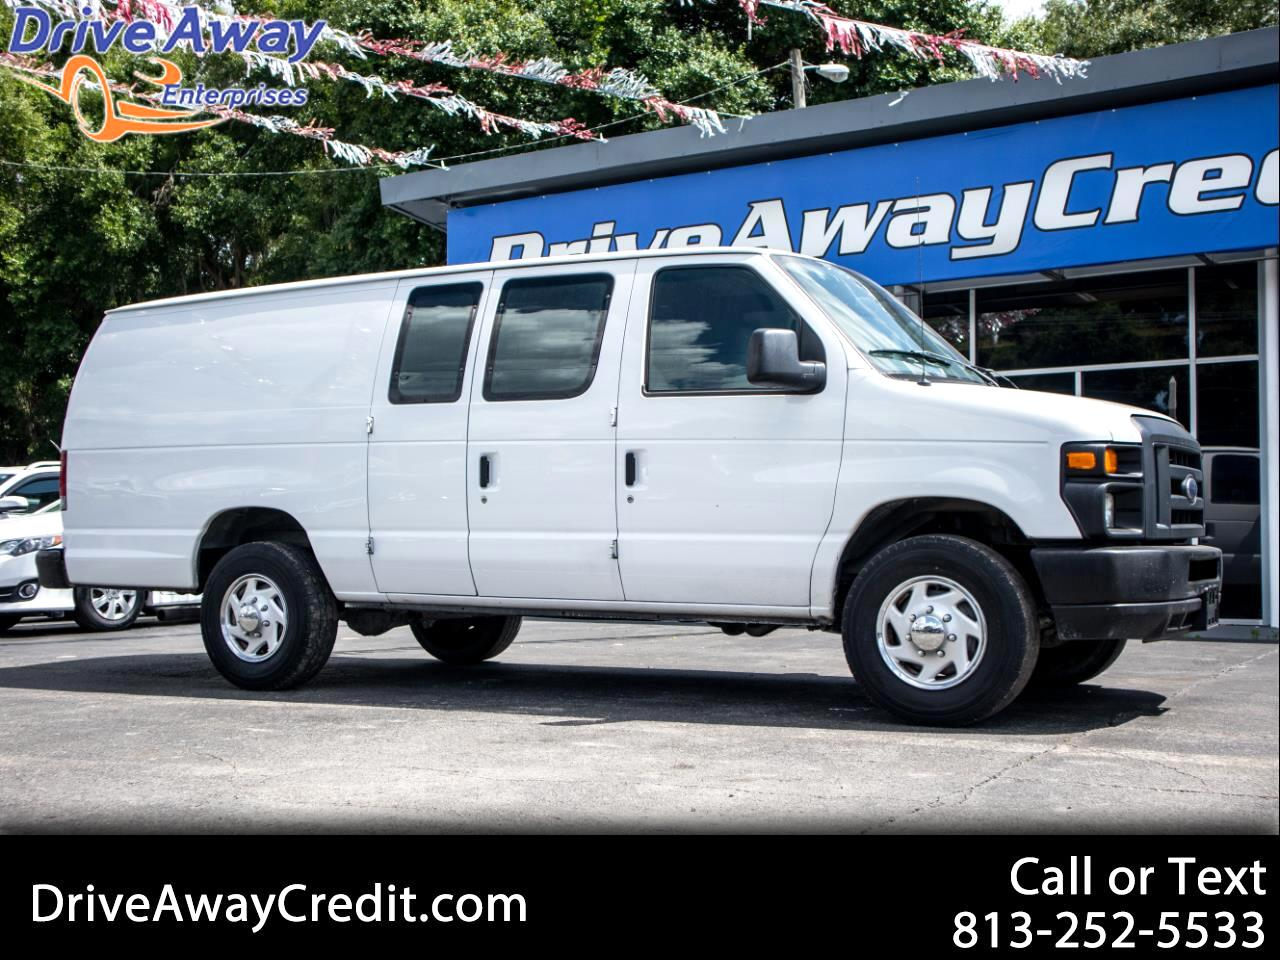 2013 Ford Econoline Cargo Van E-250 Ext Commercial